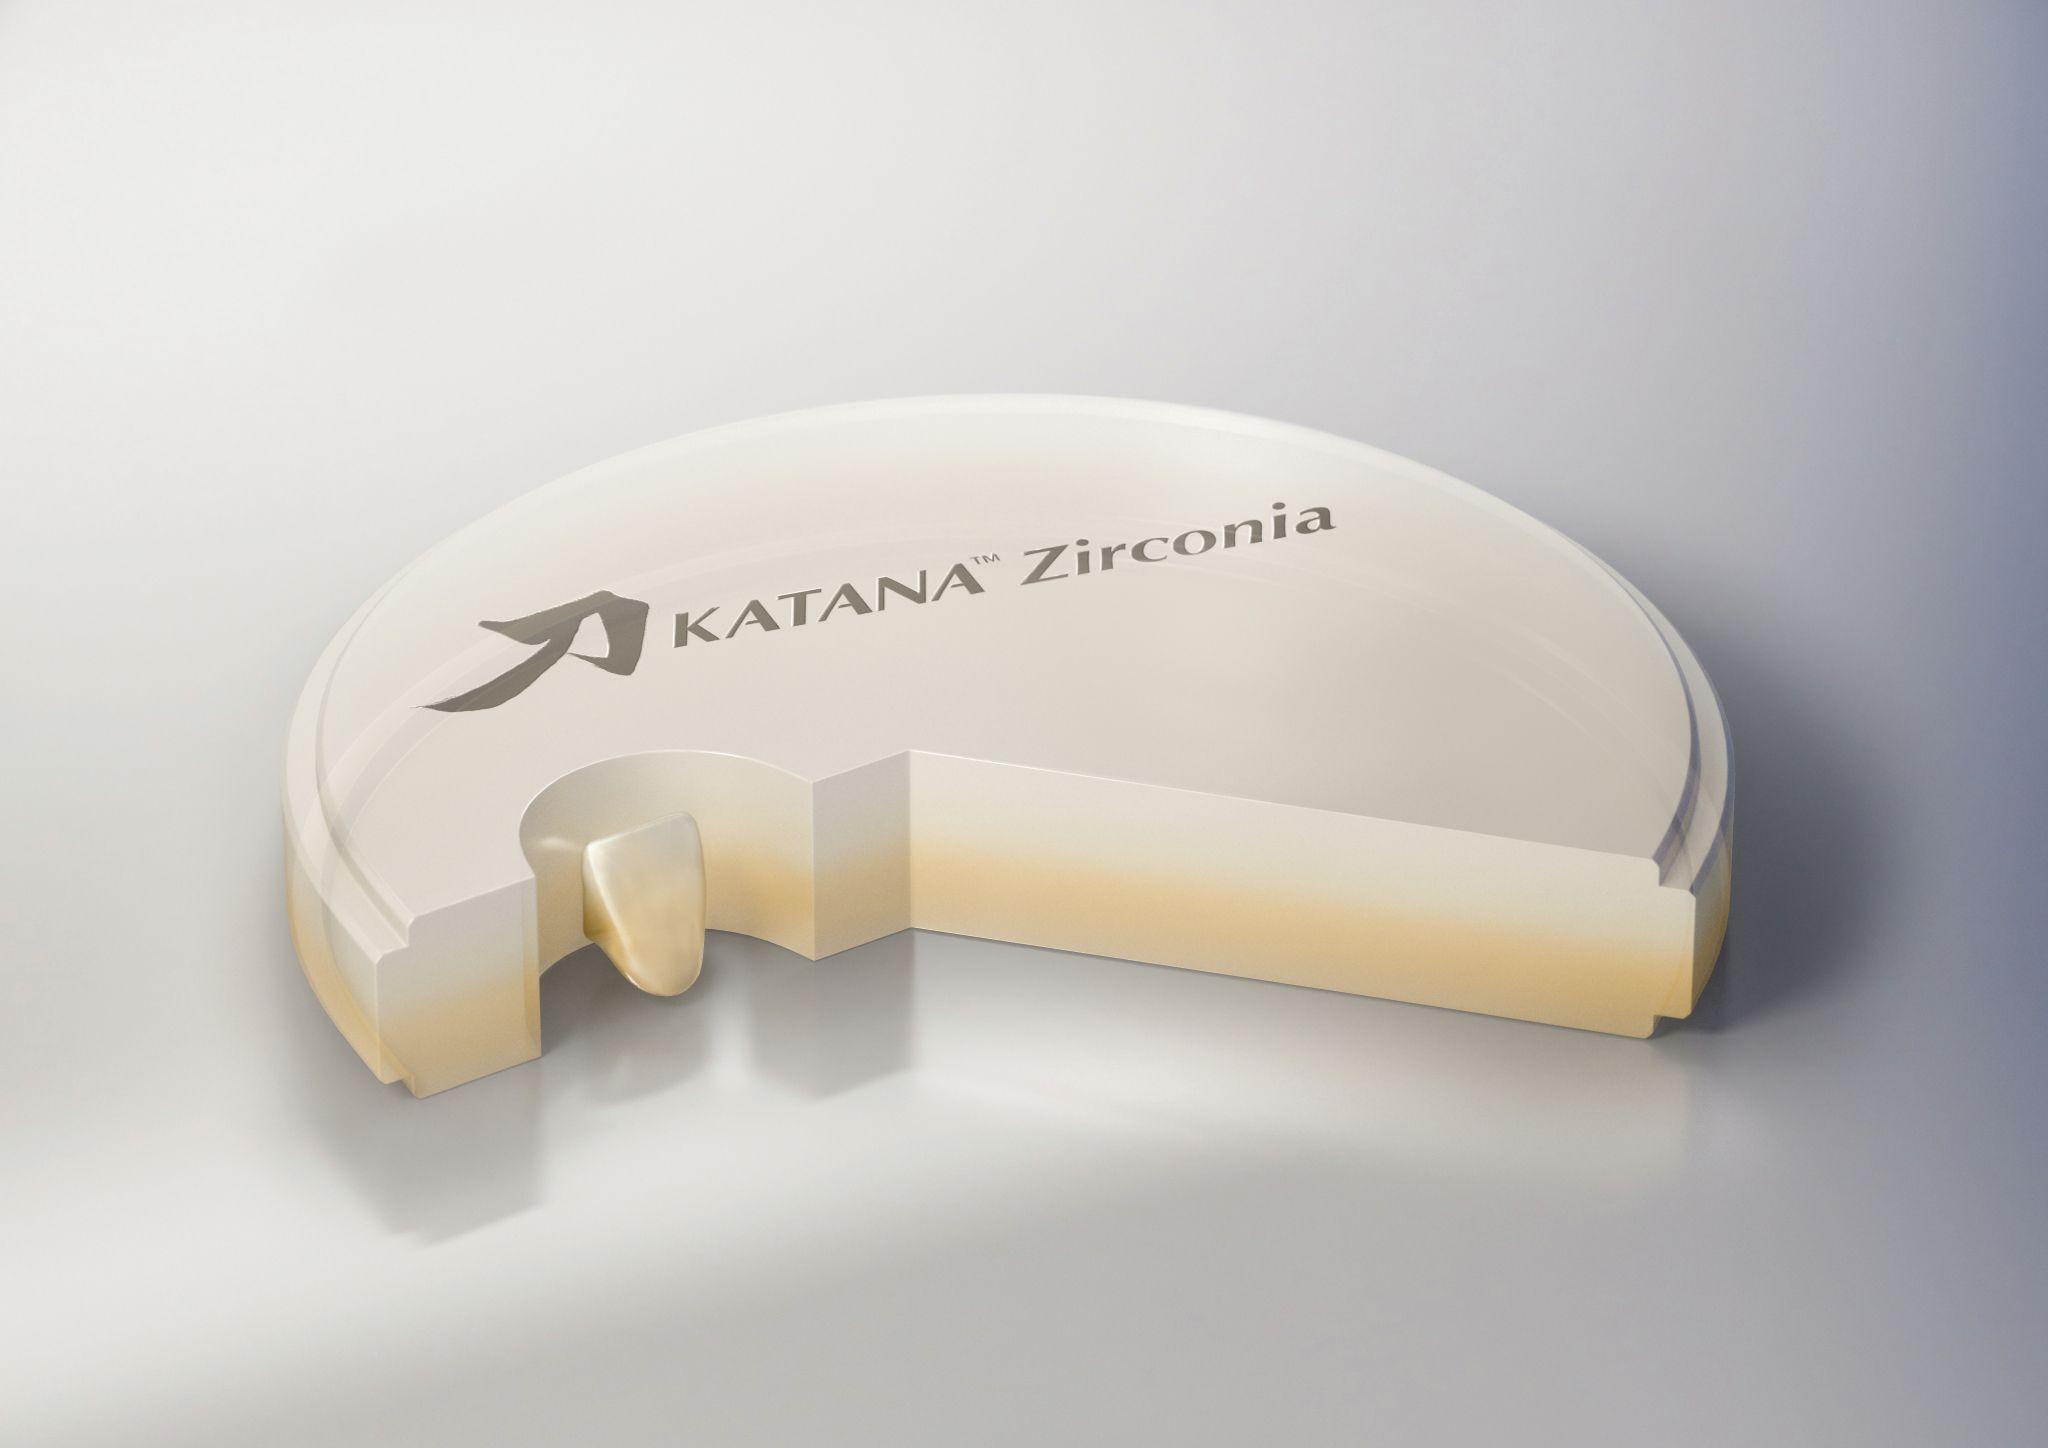 Zirconia Crown with Katana™